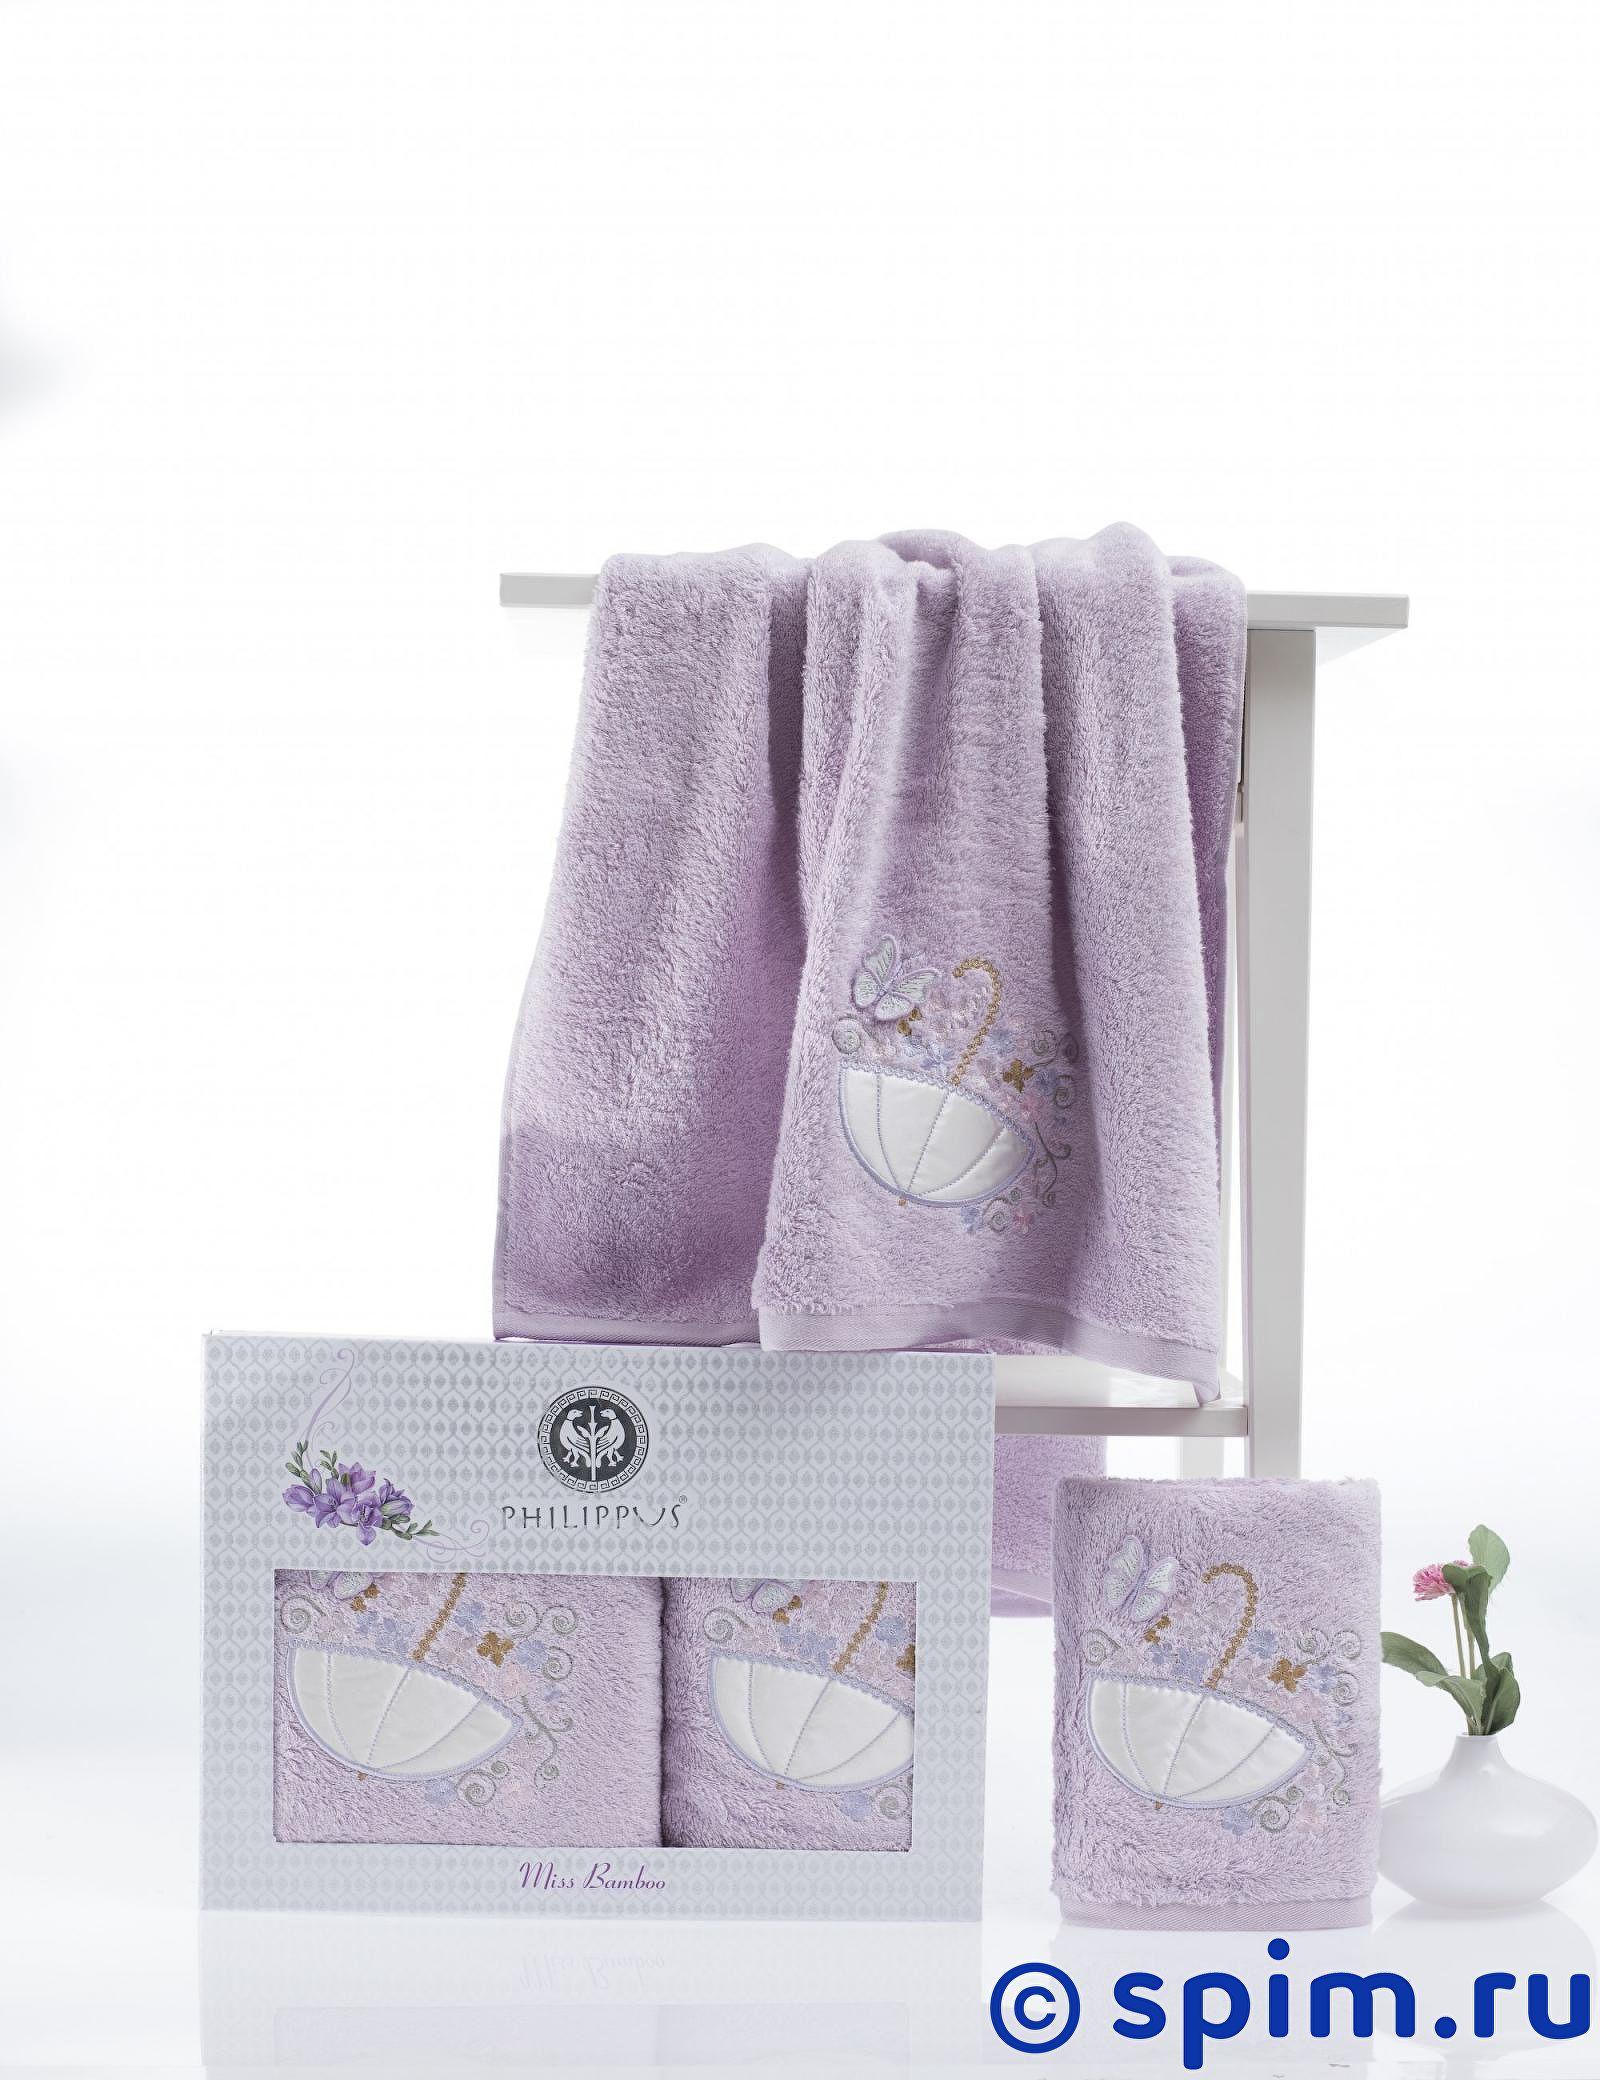 Комплект из 2-х полотенец Philippus Victoria полотенца philippus полотенце laura 50х90 см 6 шт